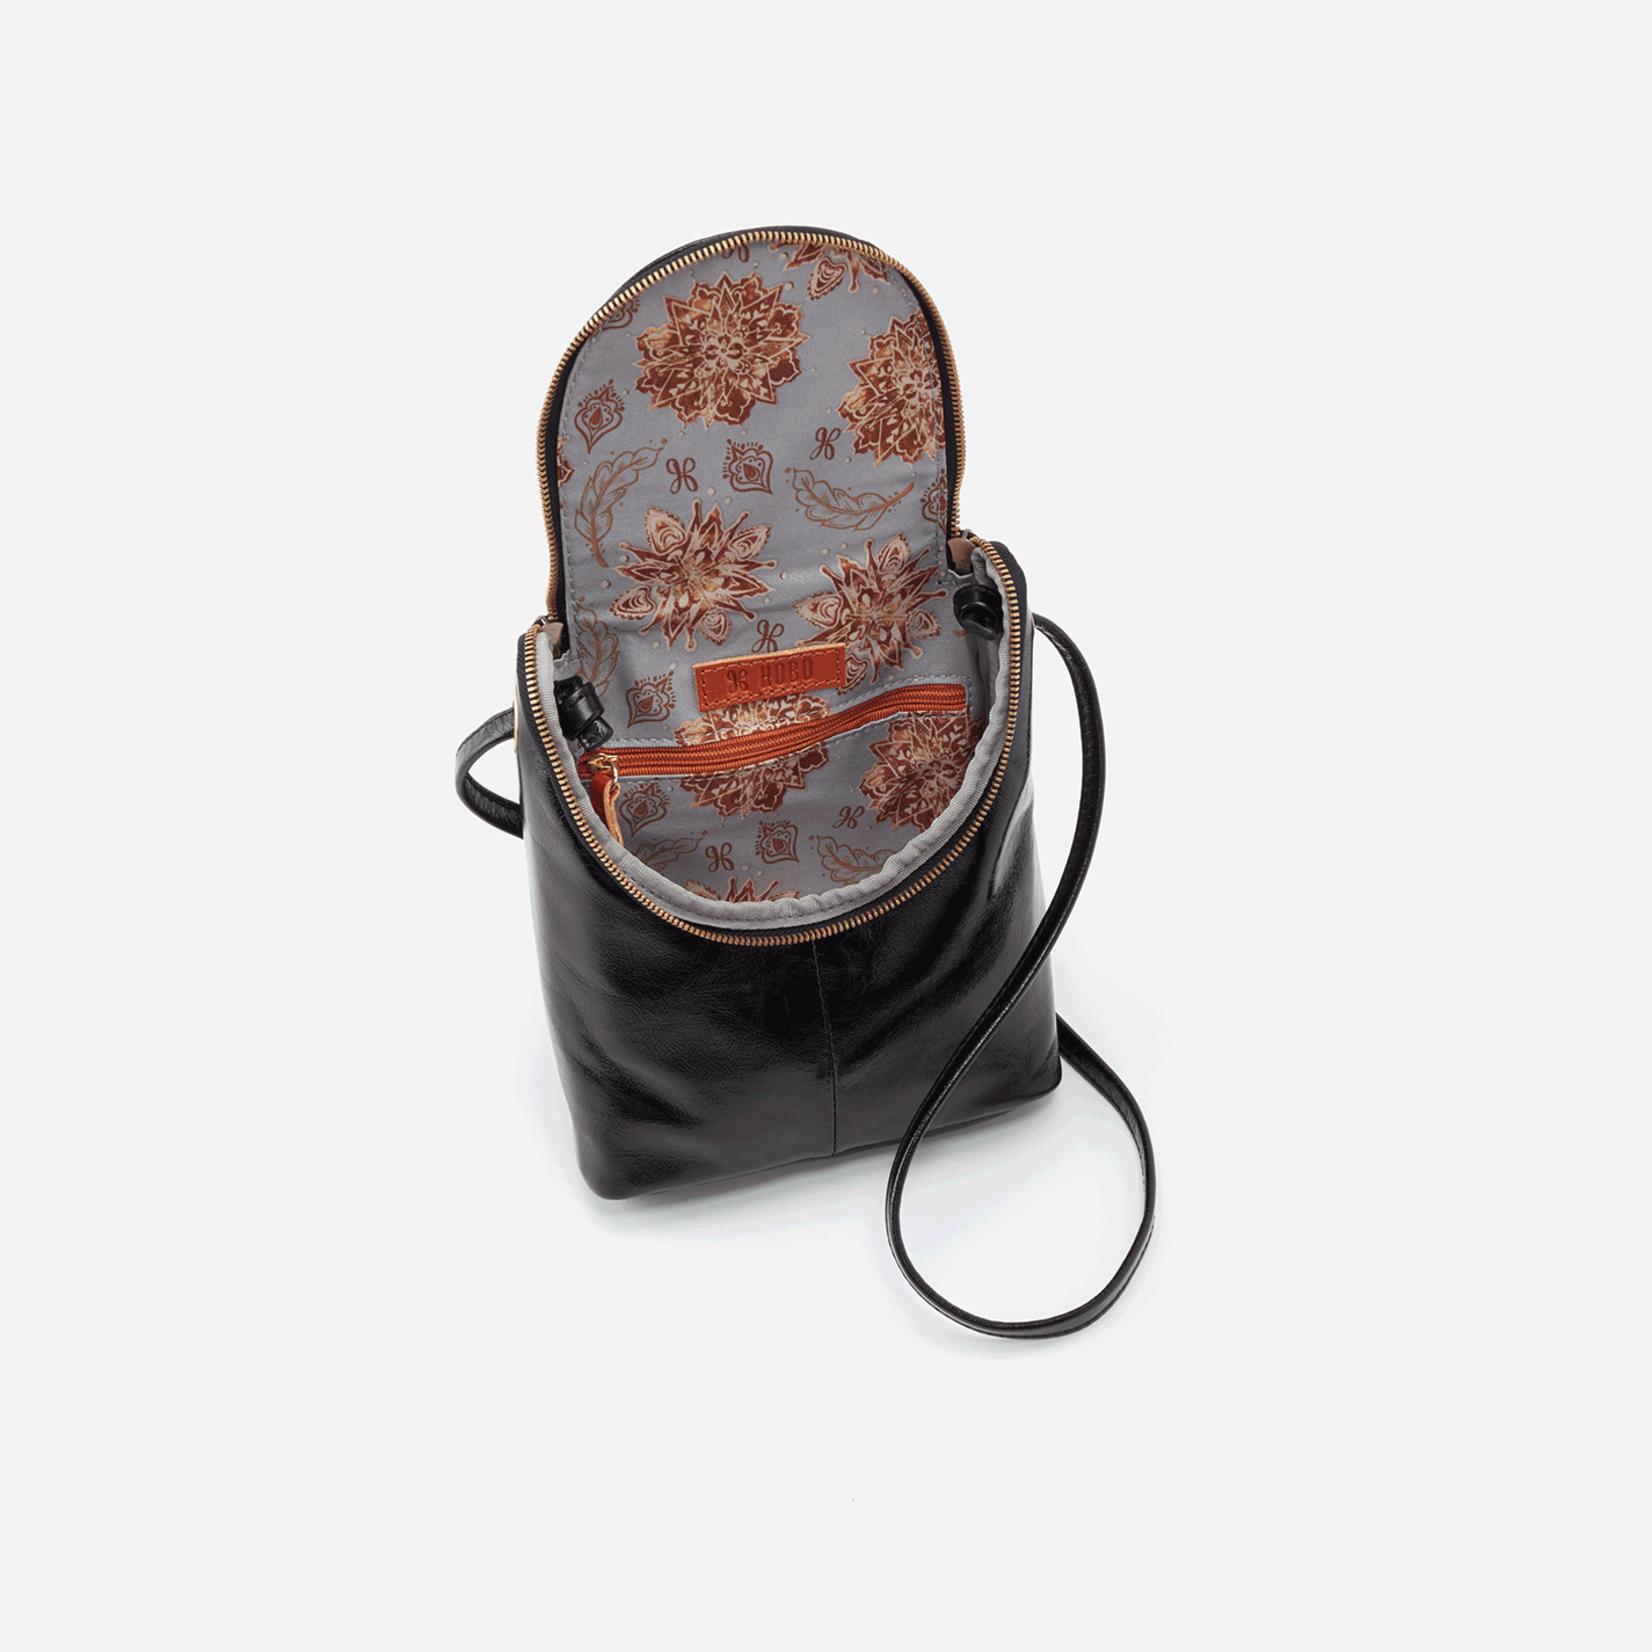 HOBO Fern Black Vintage Hide Leather Crossbody